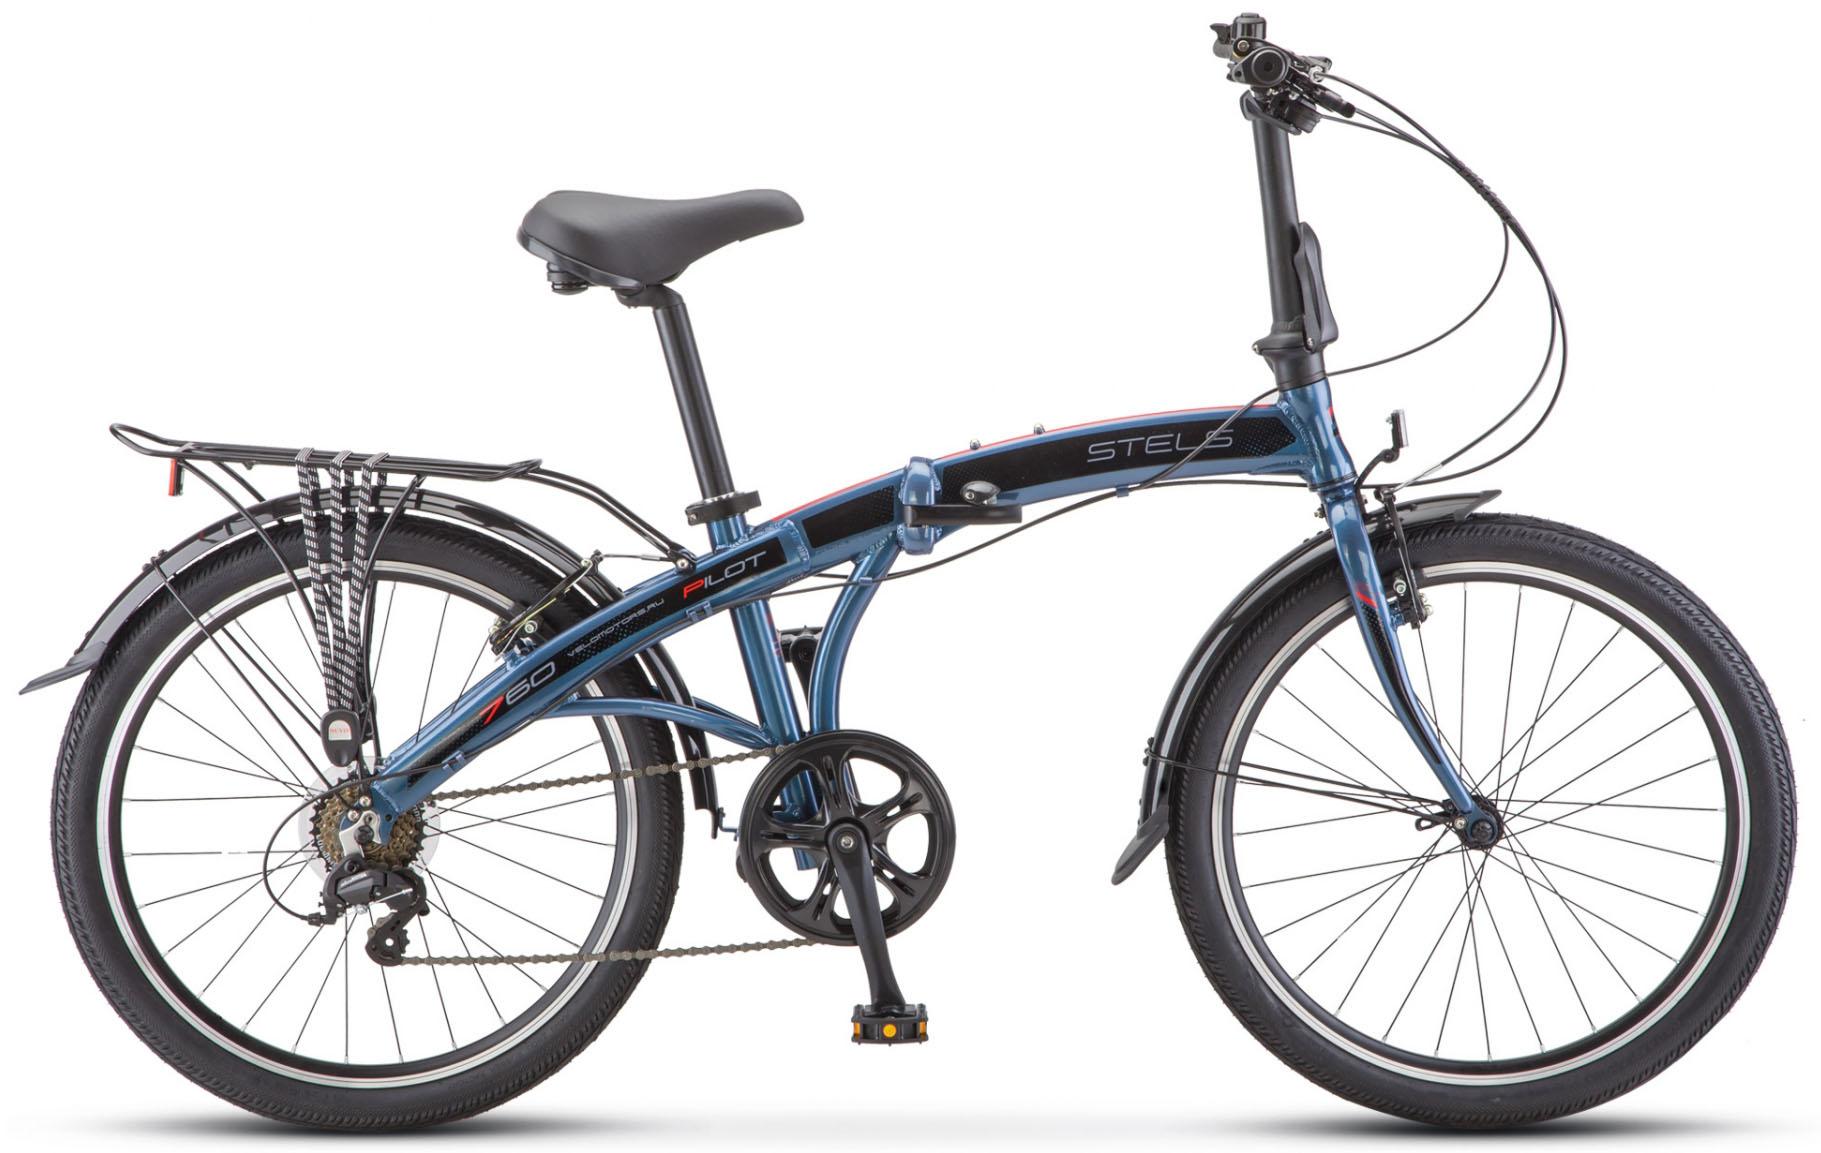 Велосипед Stels Pilot 760 24 V010 2019 велосипед stels pilot 750 2016